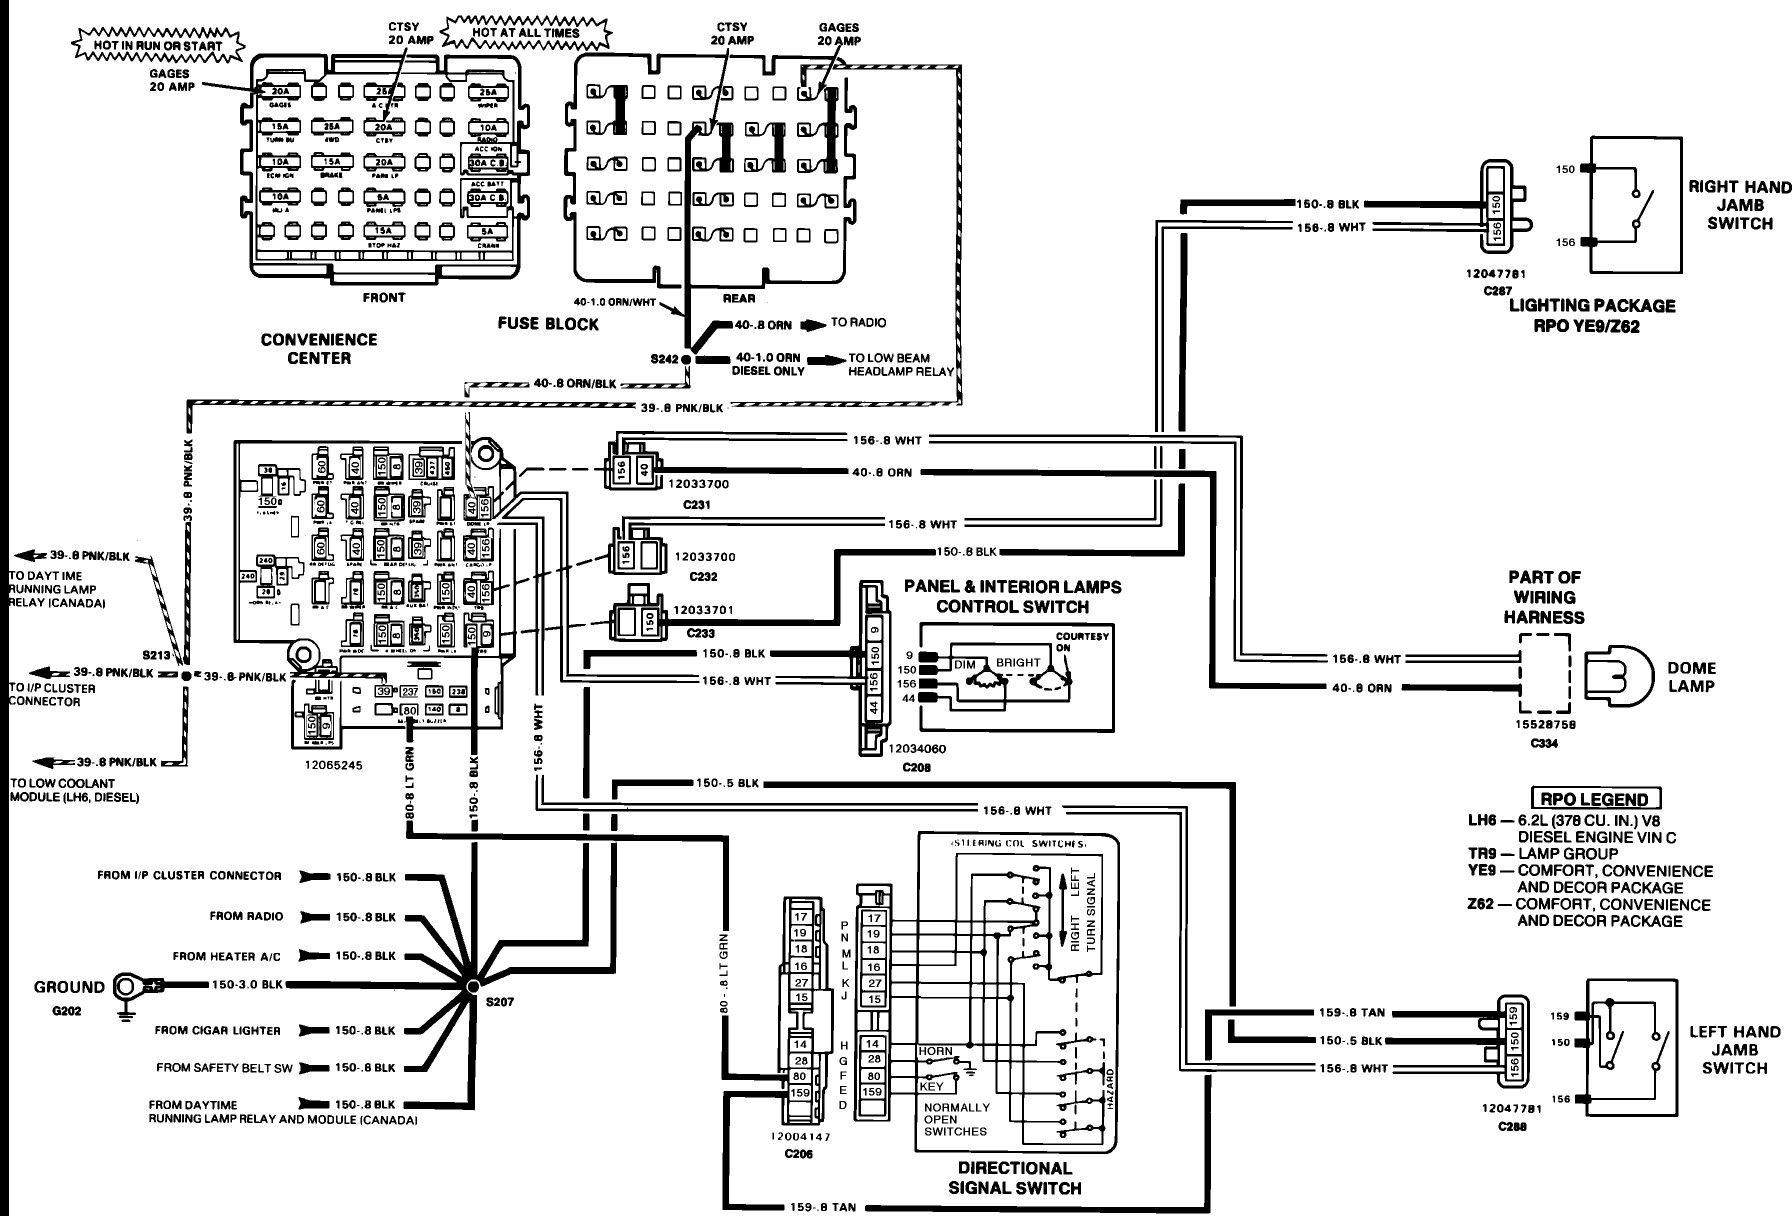 2000 Chevy Silverado Engine Diagram In 2021 Chevy Trucks 1984 Chevy Truck Electrical Wiring Diagram